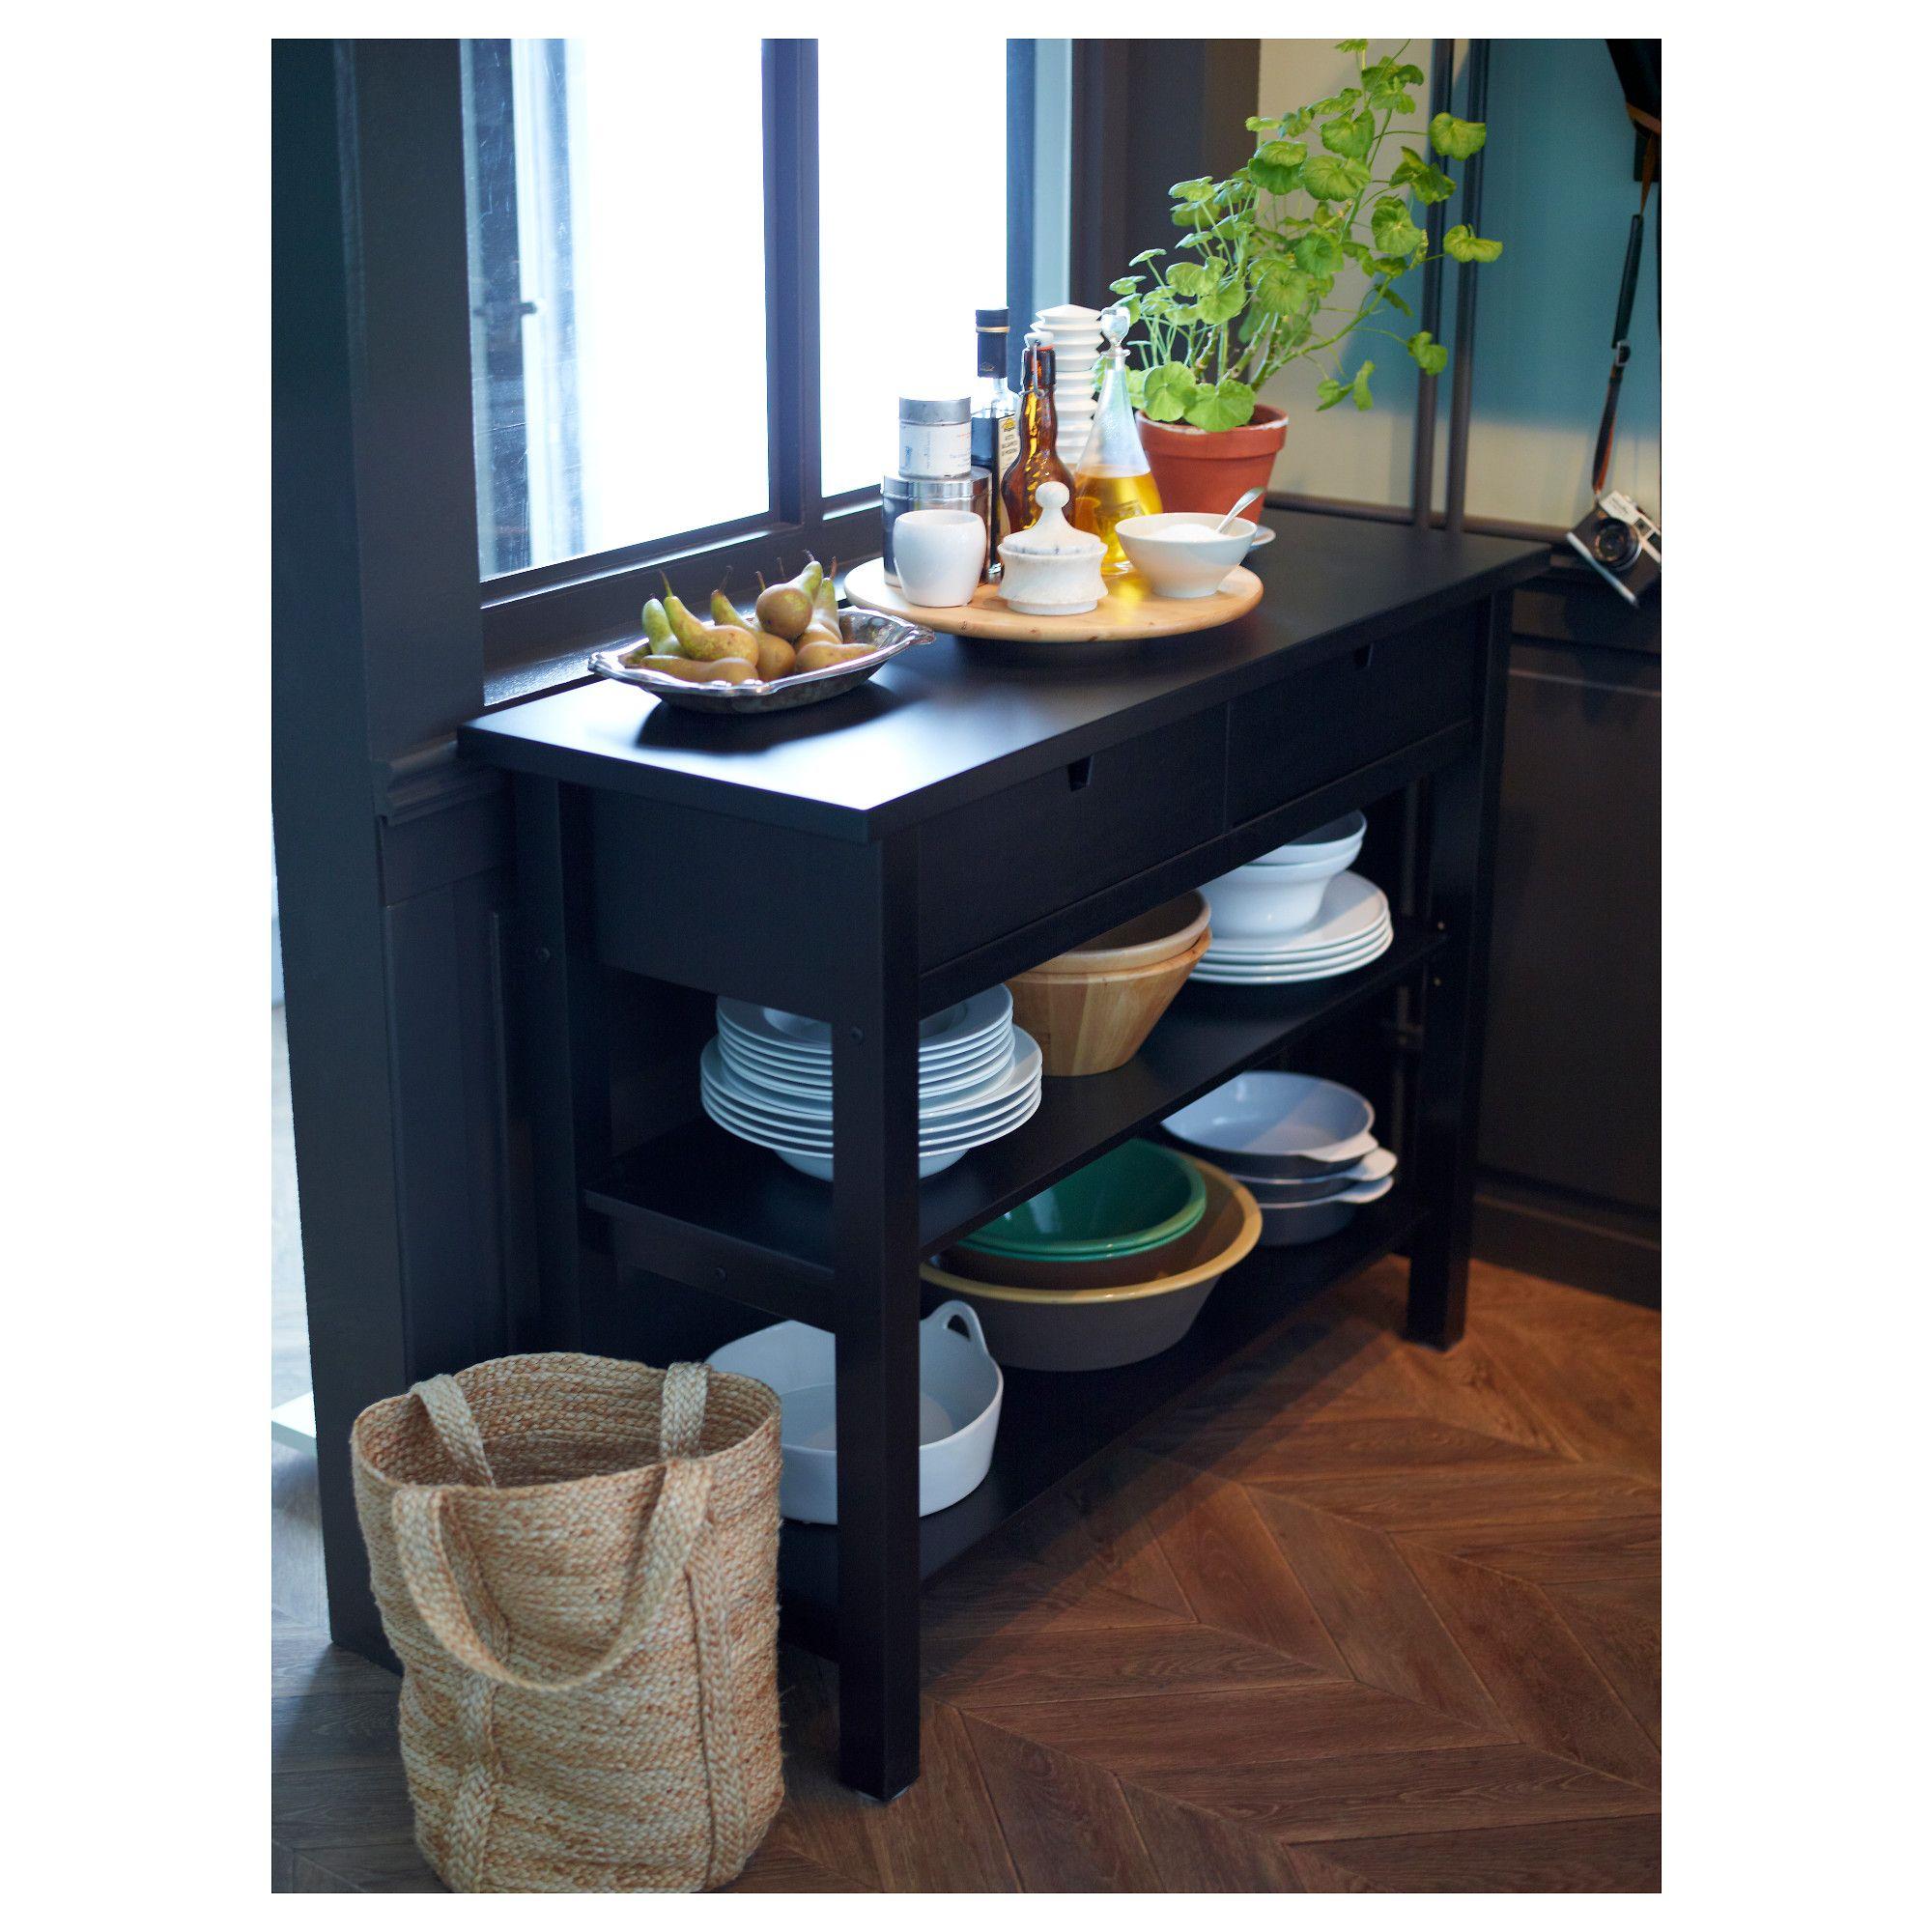 Furniture and Home Furnishings | Ikea dining, Decor, Farm ...